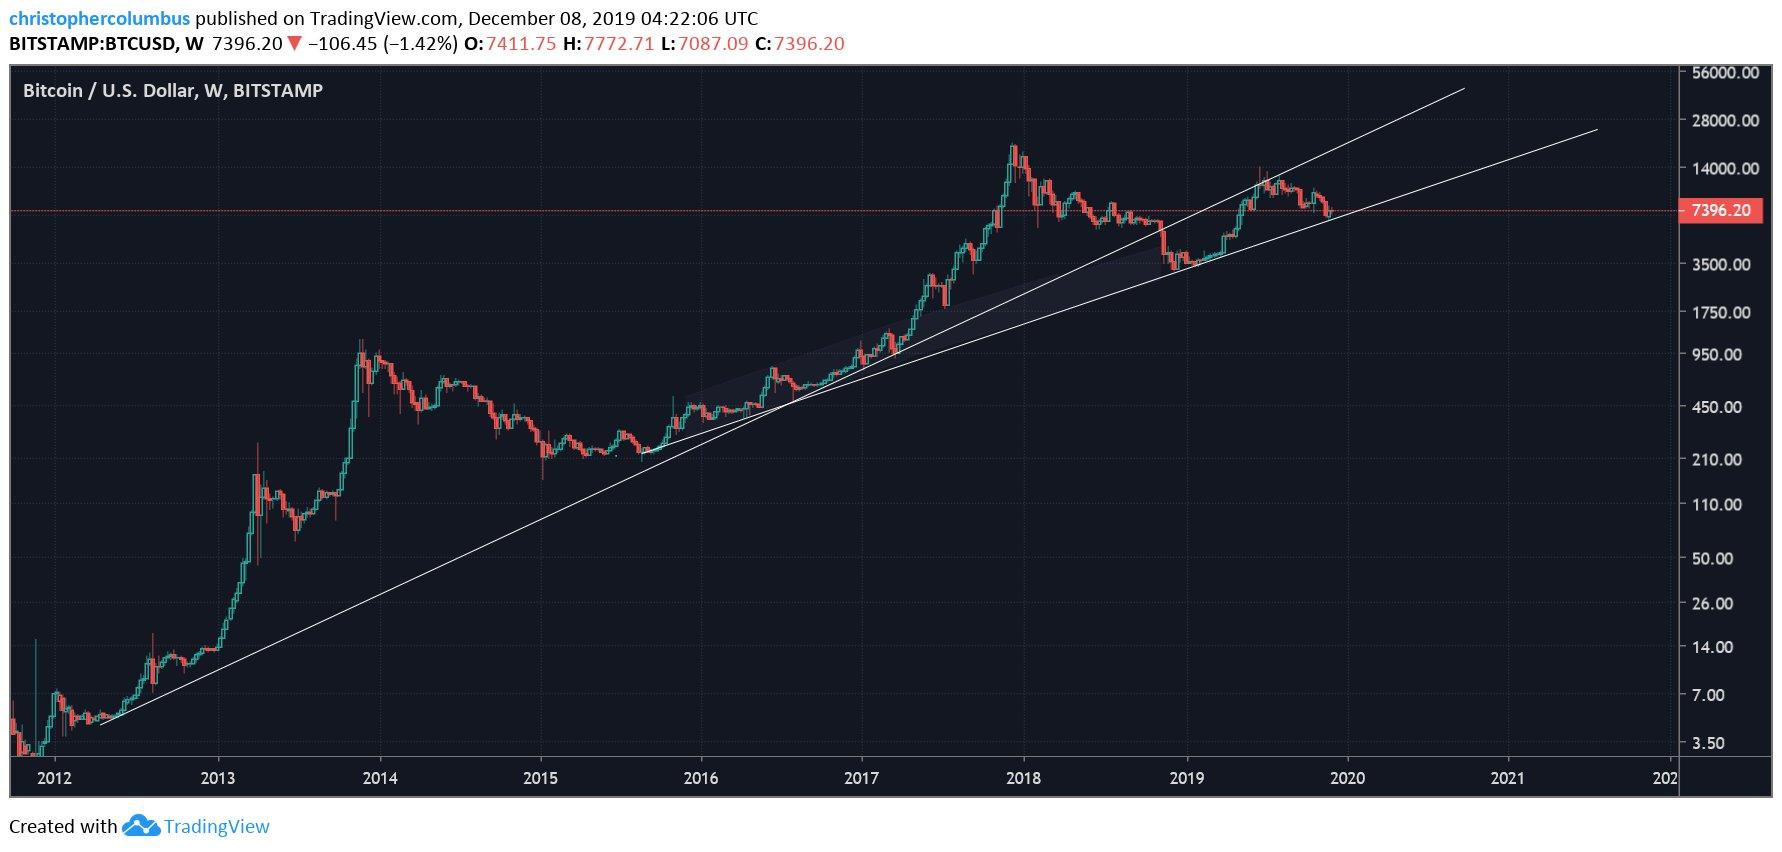 BTC US dollar price chart